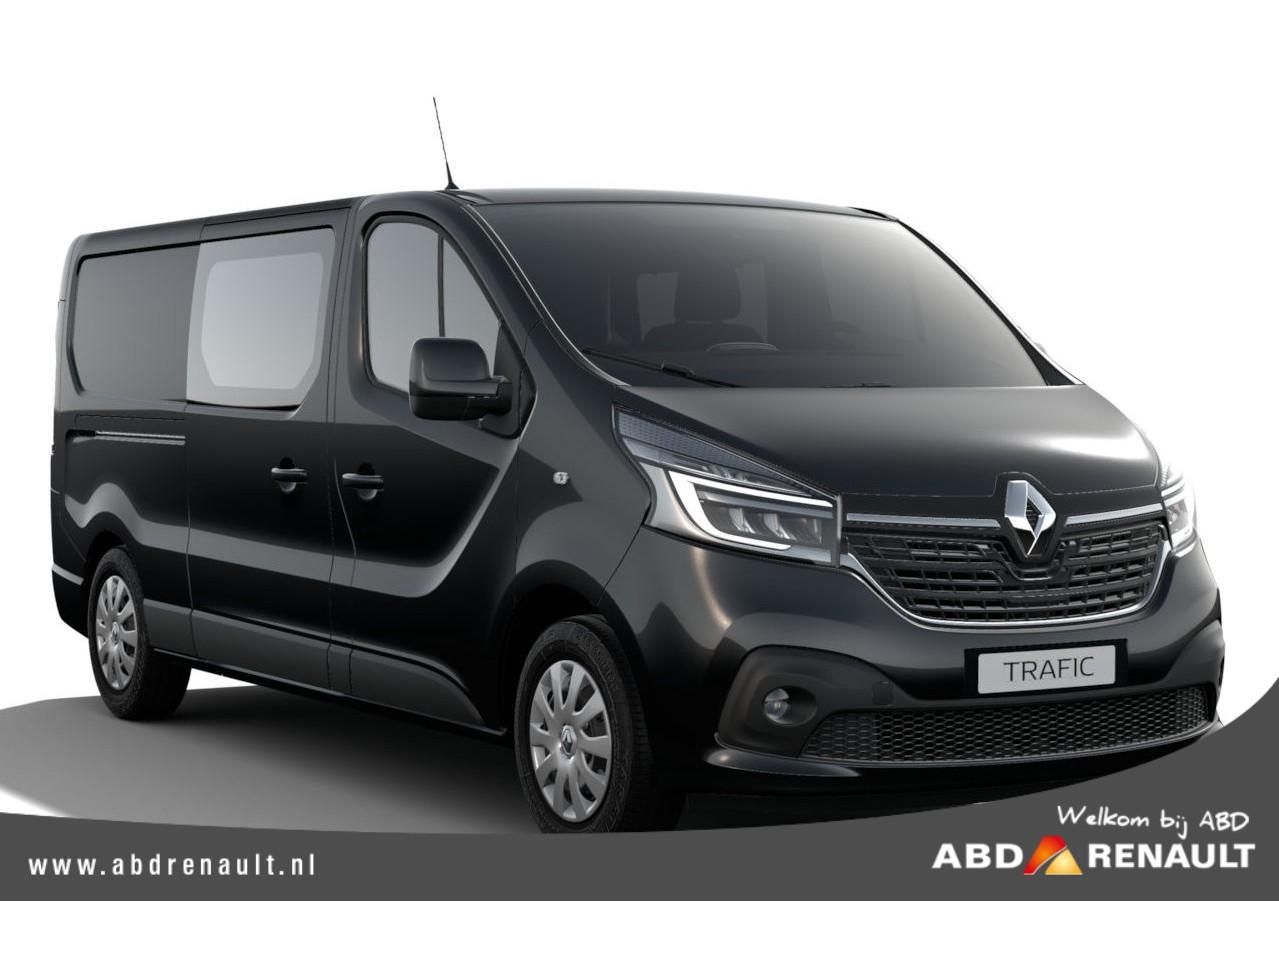 Renault Trafic 2.0 dci 120 t29 l2h1 dc business edition dubbele cabine nu rijklaar 25.365,- !